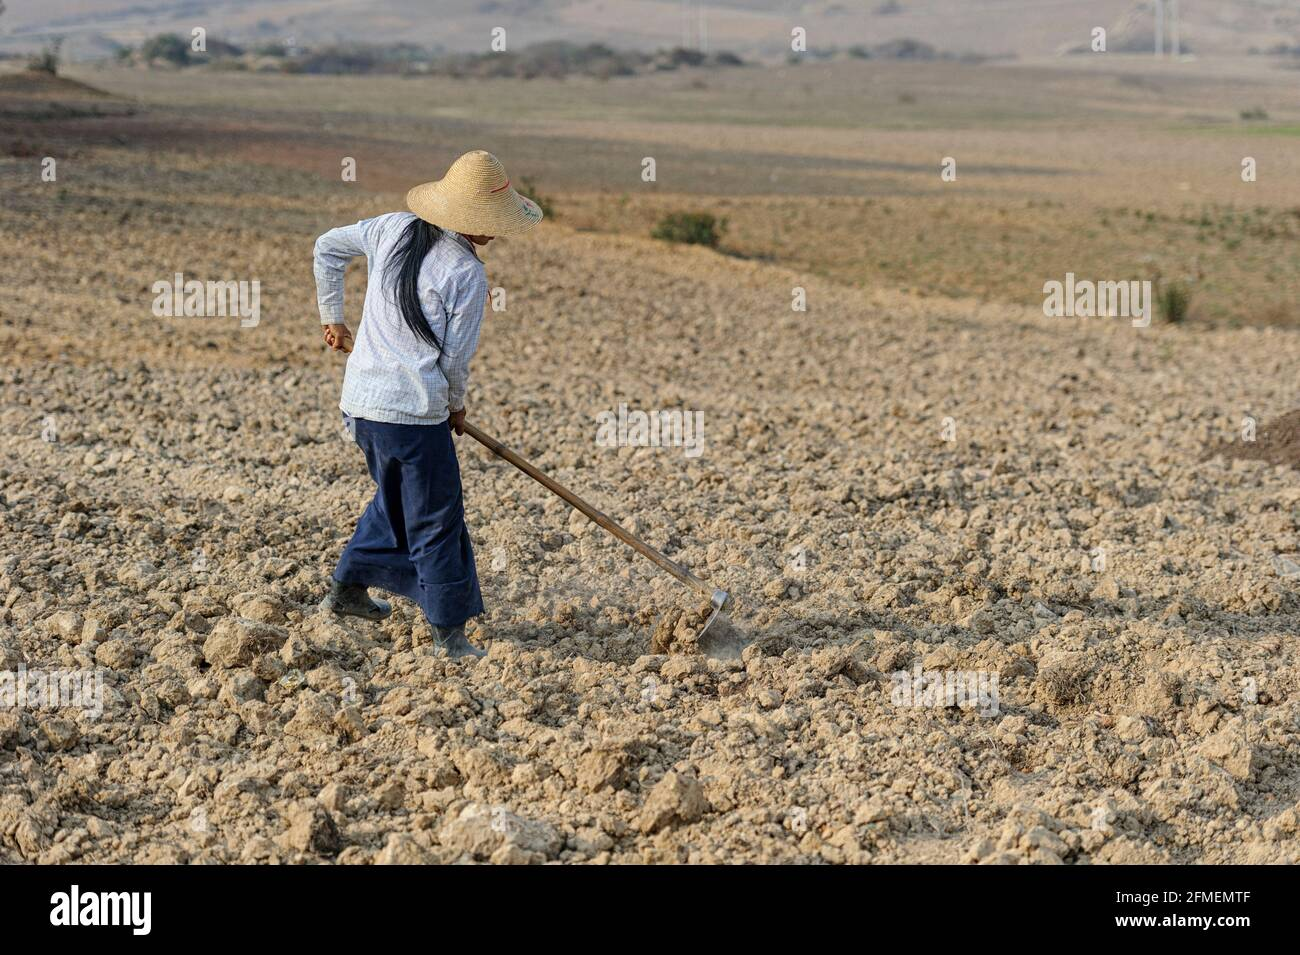 woman-harvesting-in-a-taro-root-colocasia-esculenta-field-shan-state-myanmar-2FMEMTF.jpg